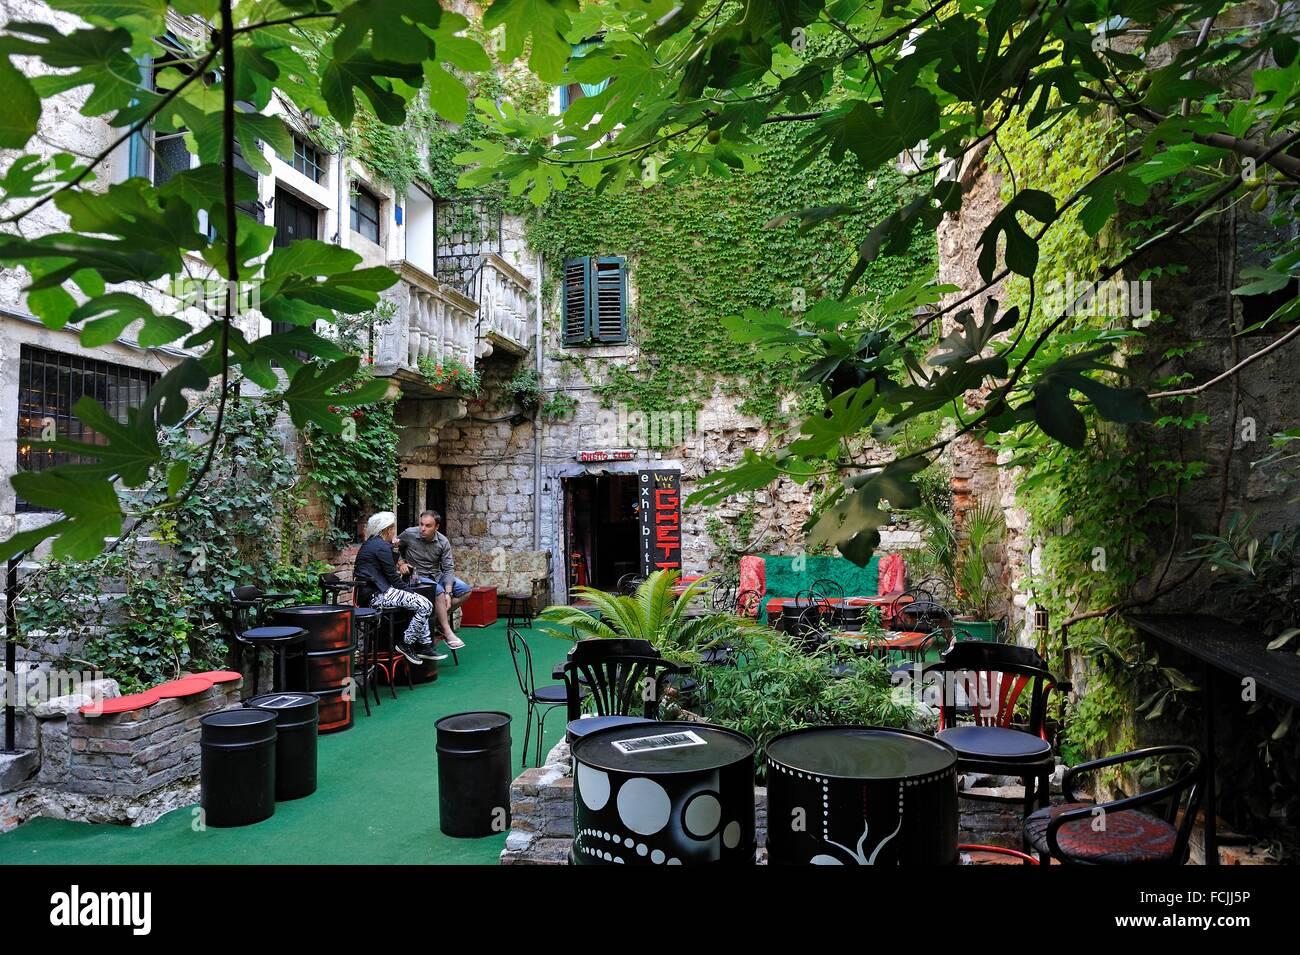 Academia Ghetto Club, Dosud 10 street, Old Town, Split, Croatia, Southeast Europe. - Stock Image